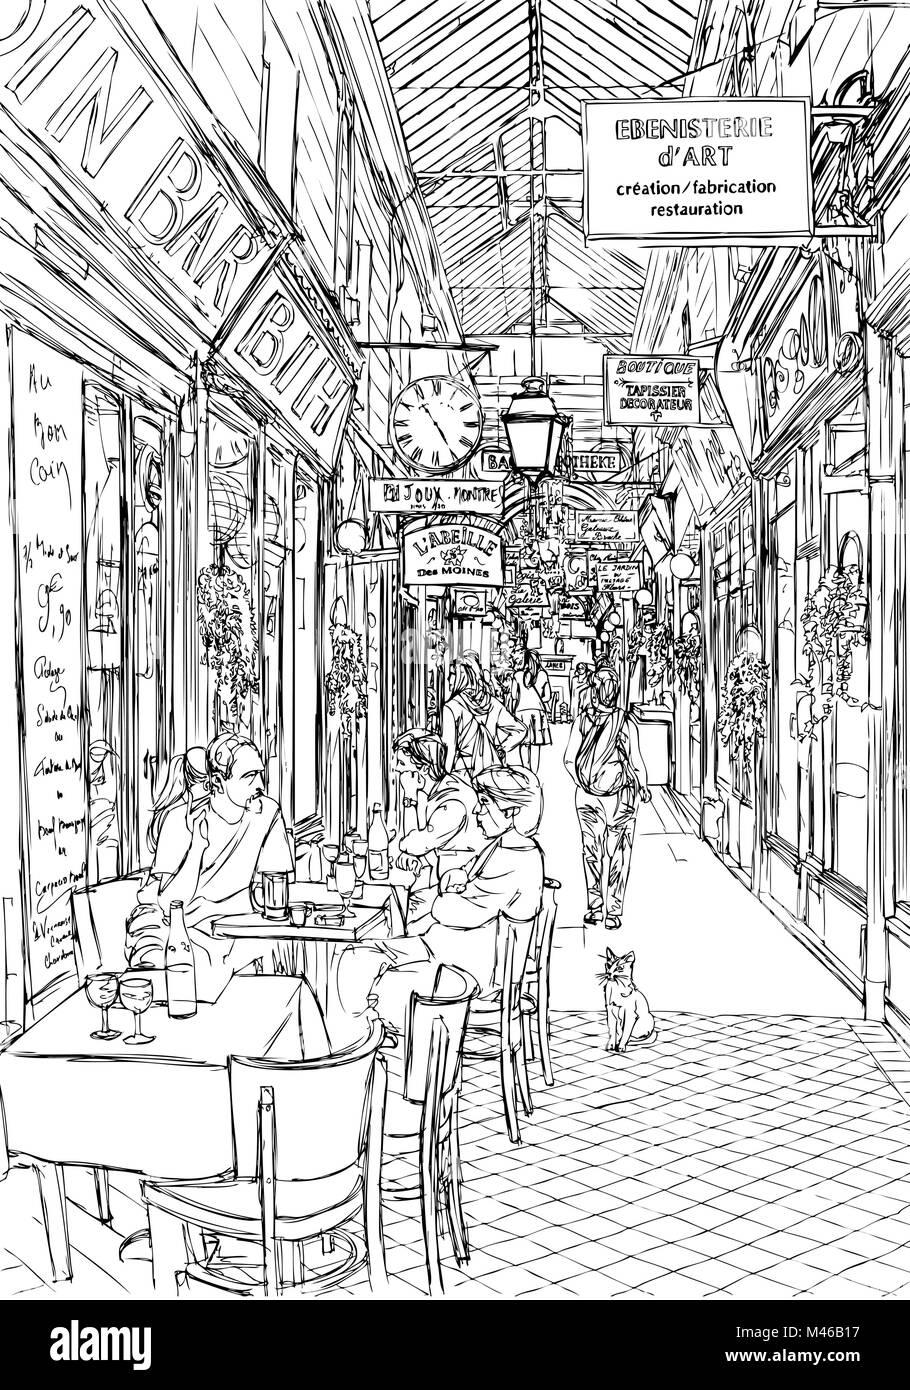 Arcade in Paris - vector illustration - Stock Vector